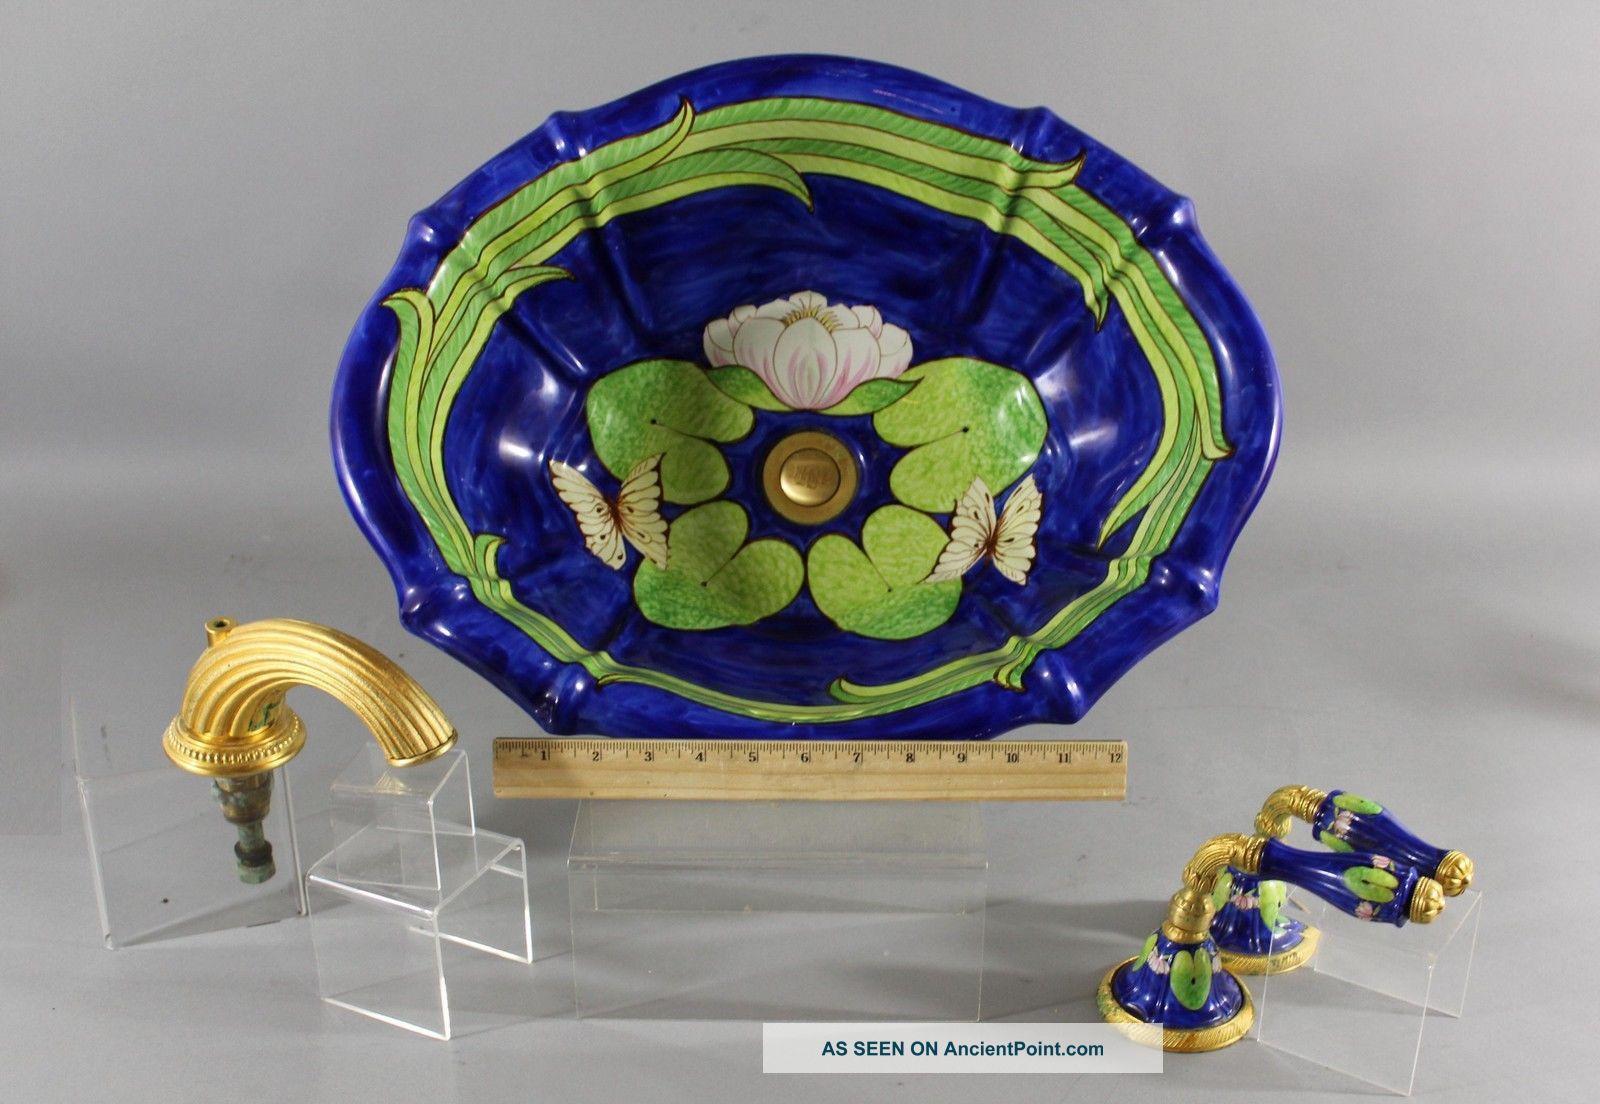 Vintage Sherle Wagner Hand Painted Italian Porcelain Bathroom Sink,  The Lilies Sinks photo